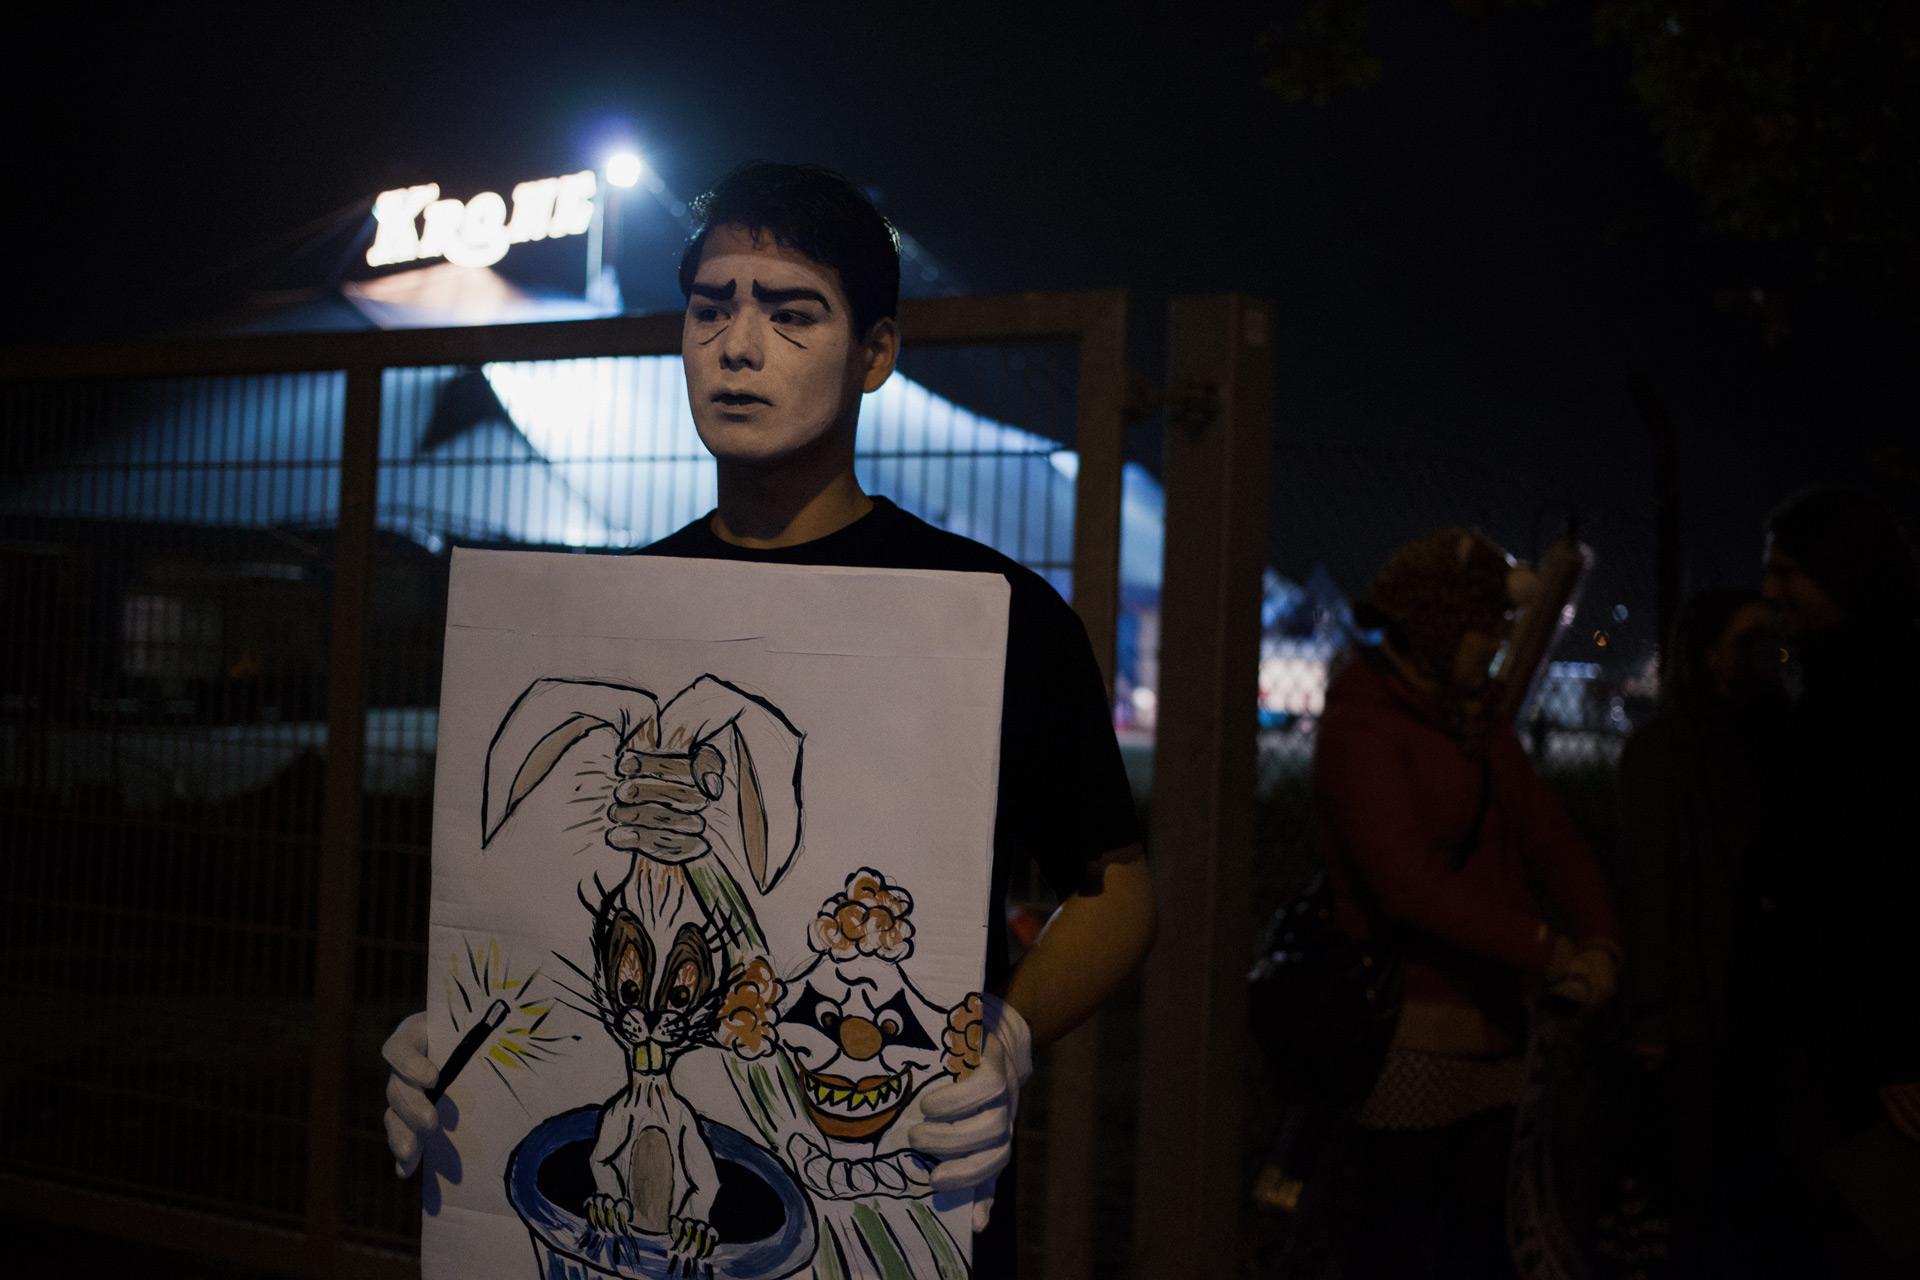 timo-stammberger-photography-fotografie-animal-rights-tierrechte-activism-aktivismus-mitgefuehl-zirkus-krone-compassion